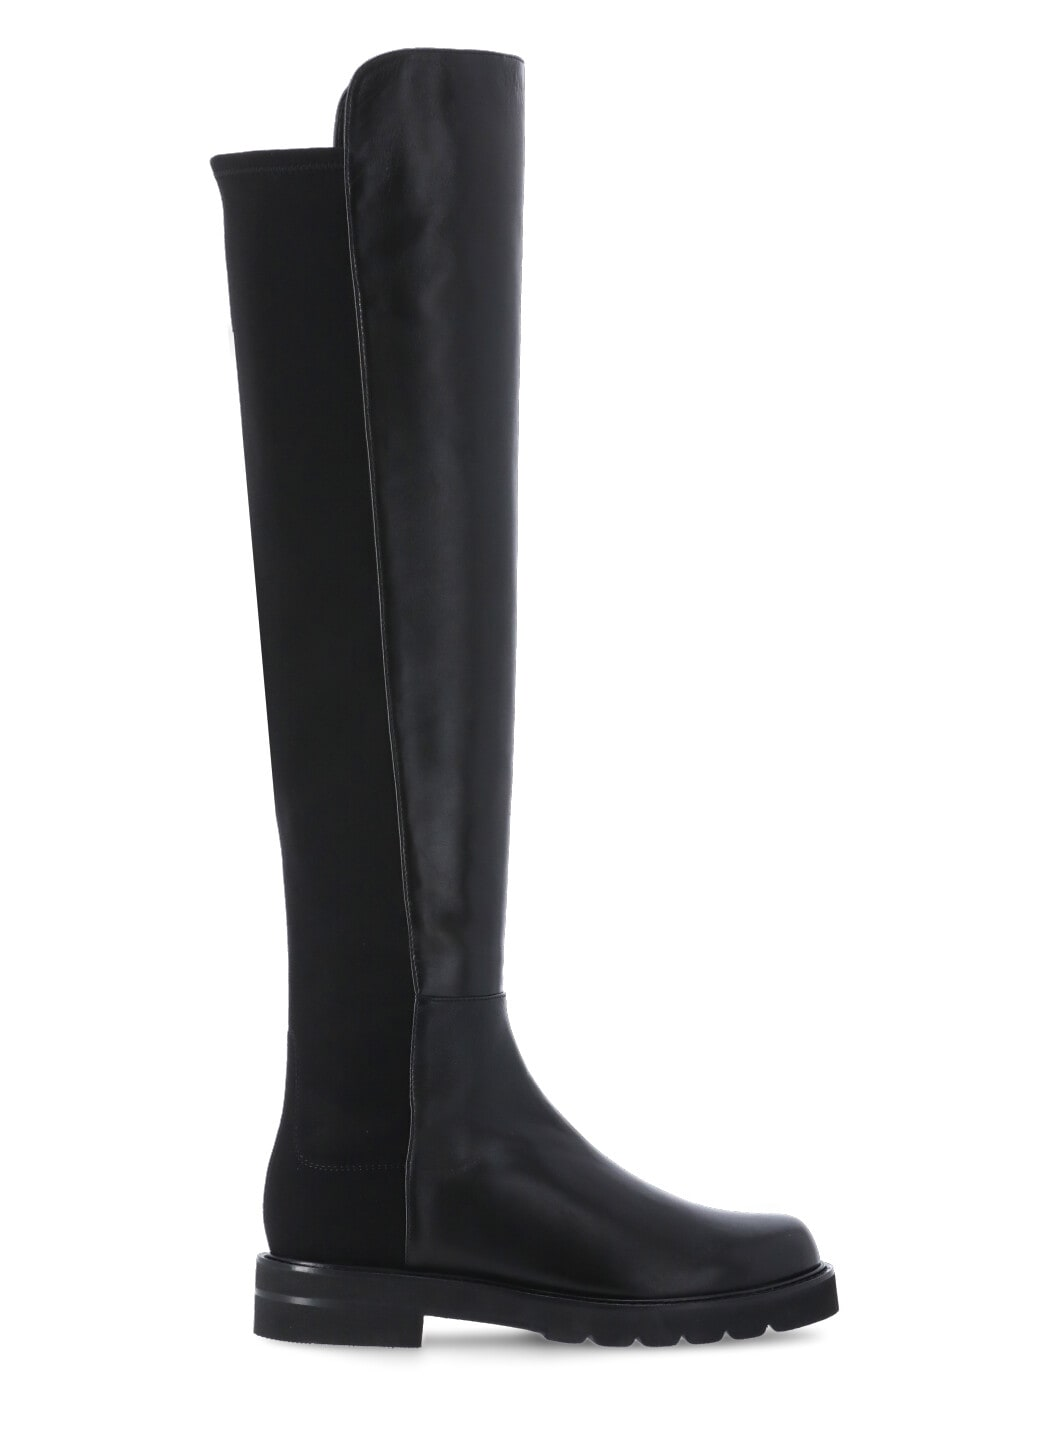 Buy Stuart Weitzman 5050 Lift Boot online, shop Stuart Weitzman shoes with free shipping